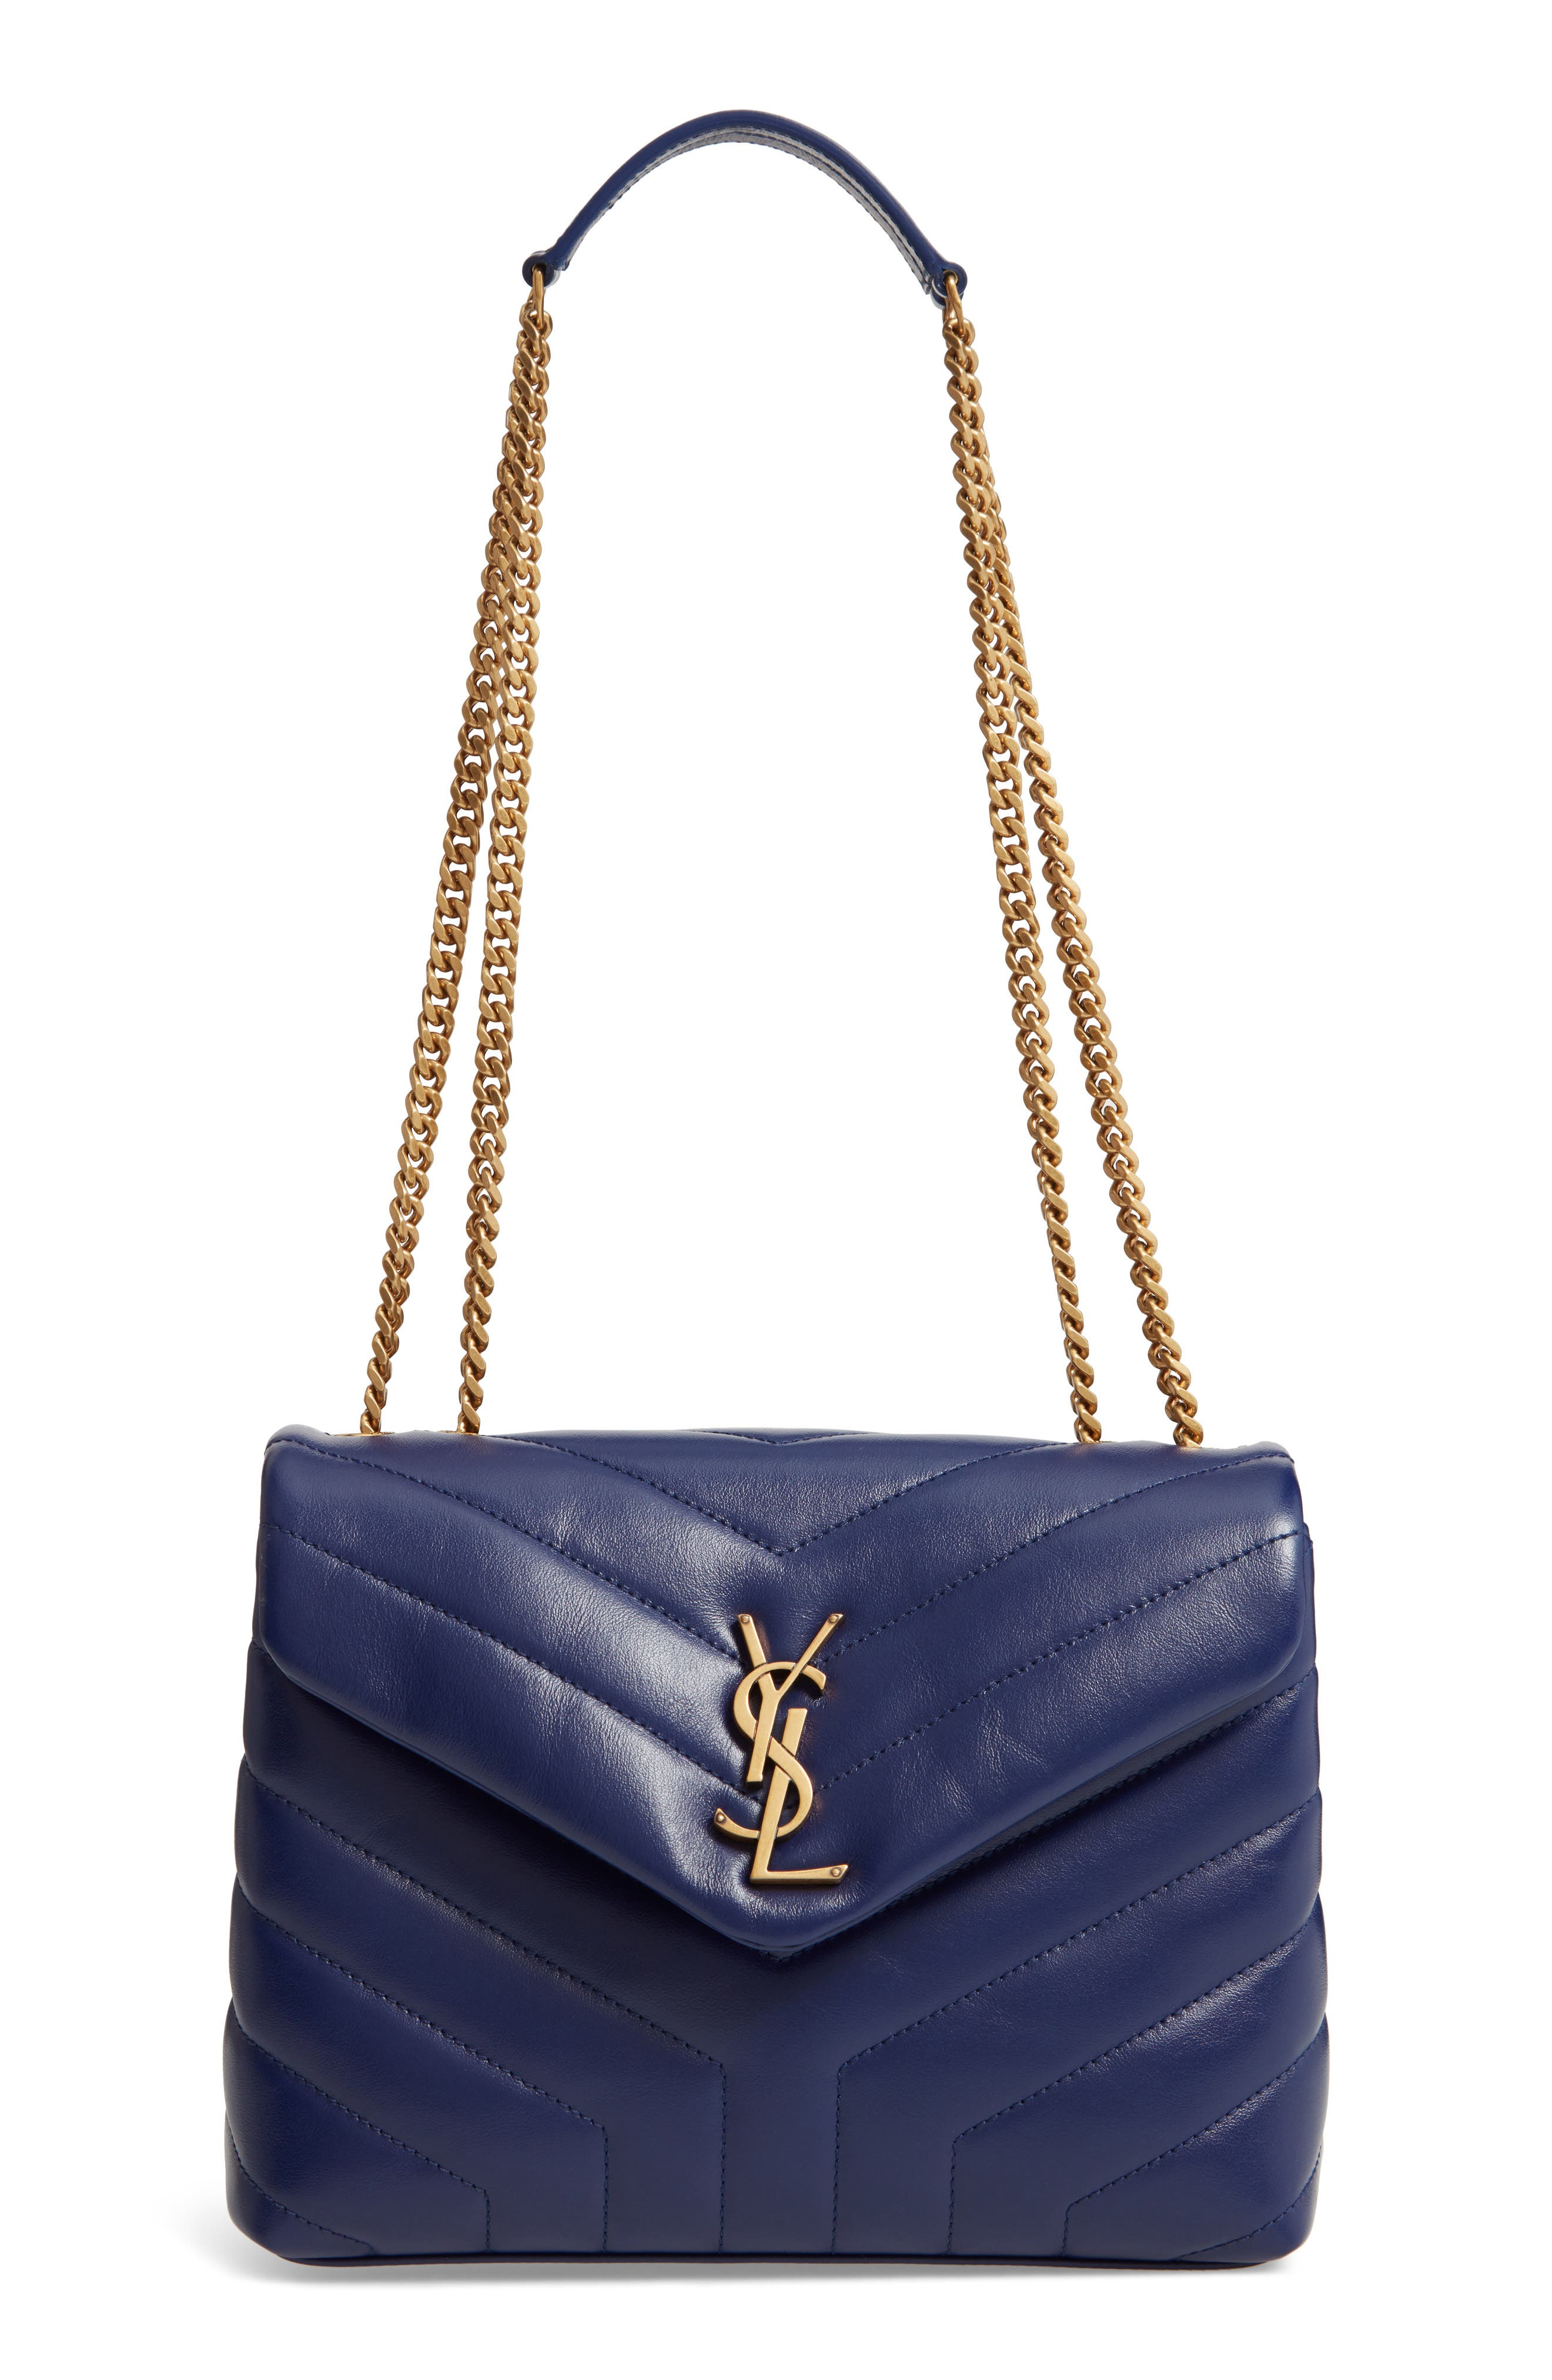 Small Loulou Leather Shoulder Bag,                             Main thumbnail 1, color,                             SAPHIR